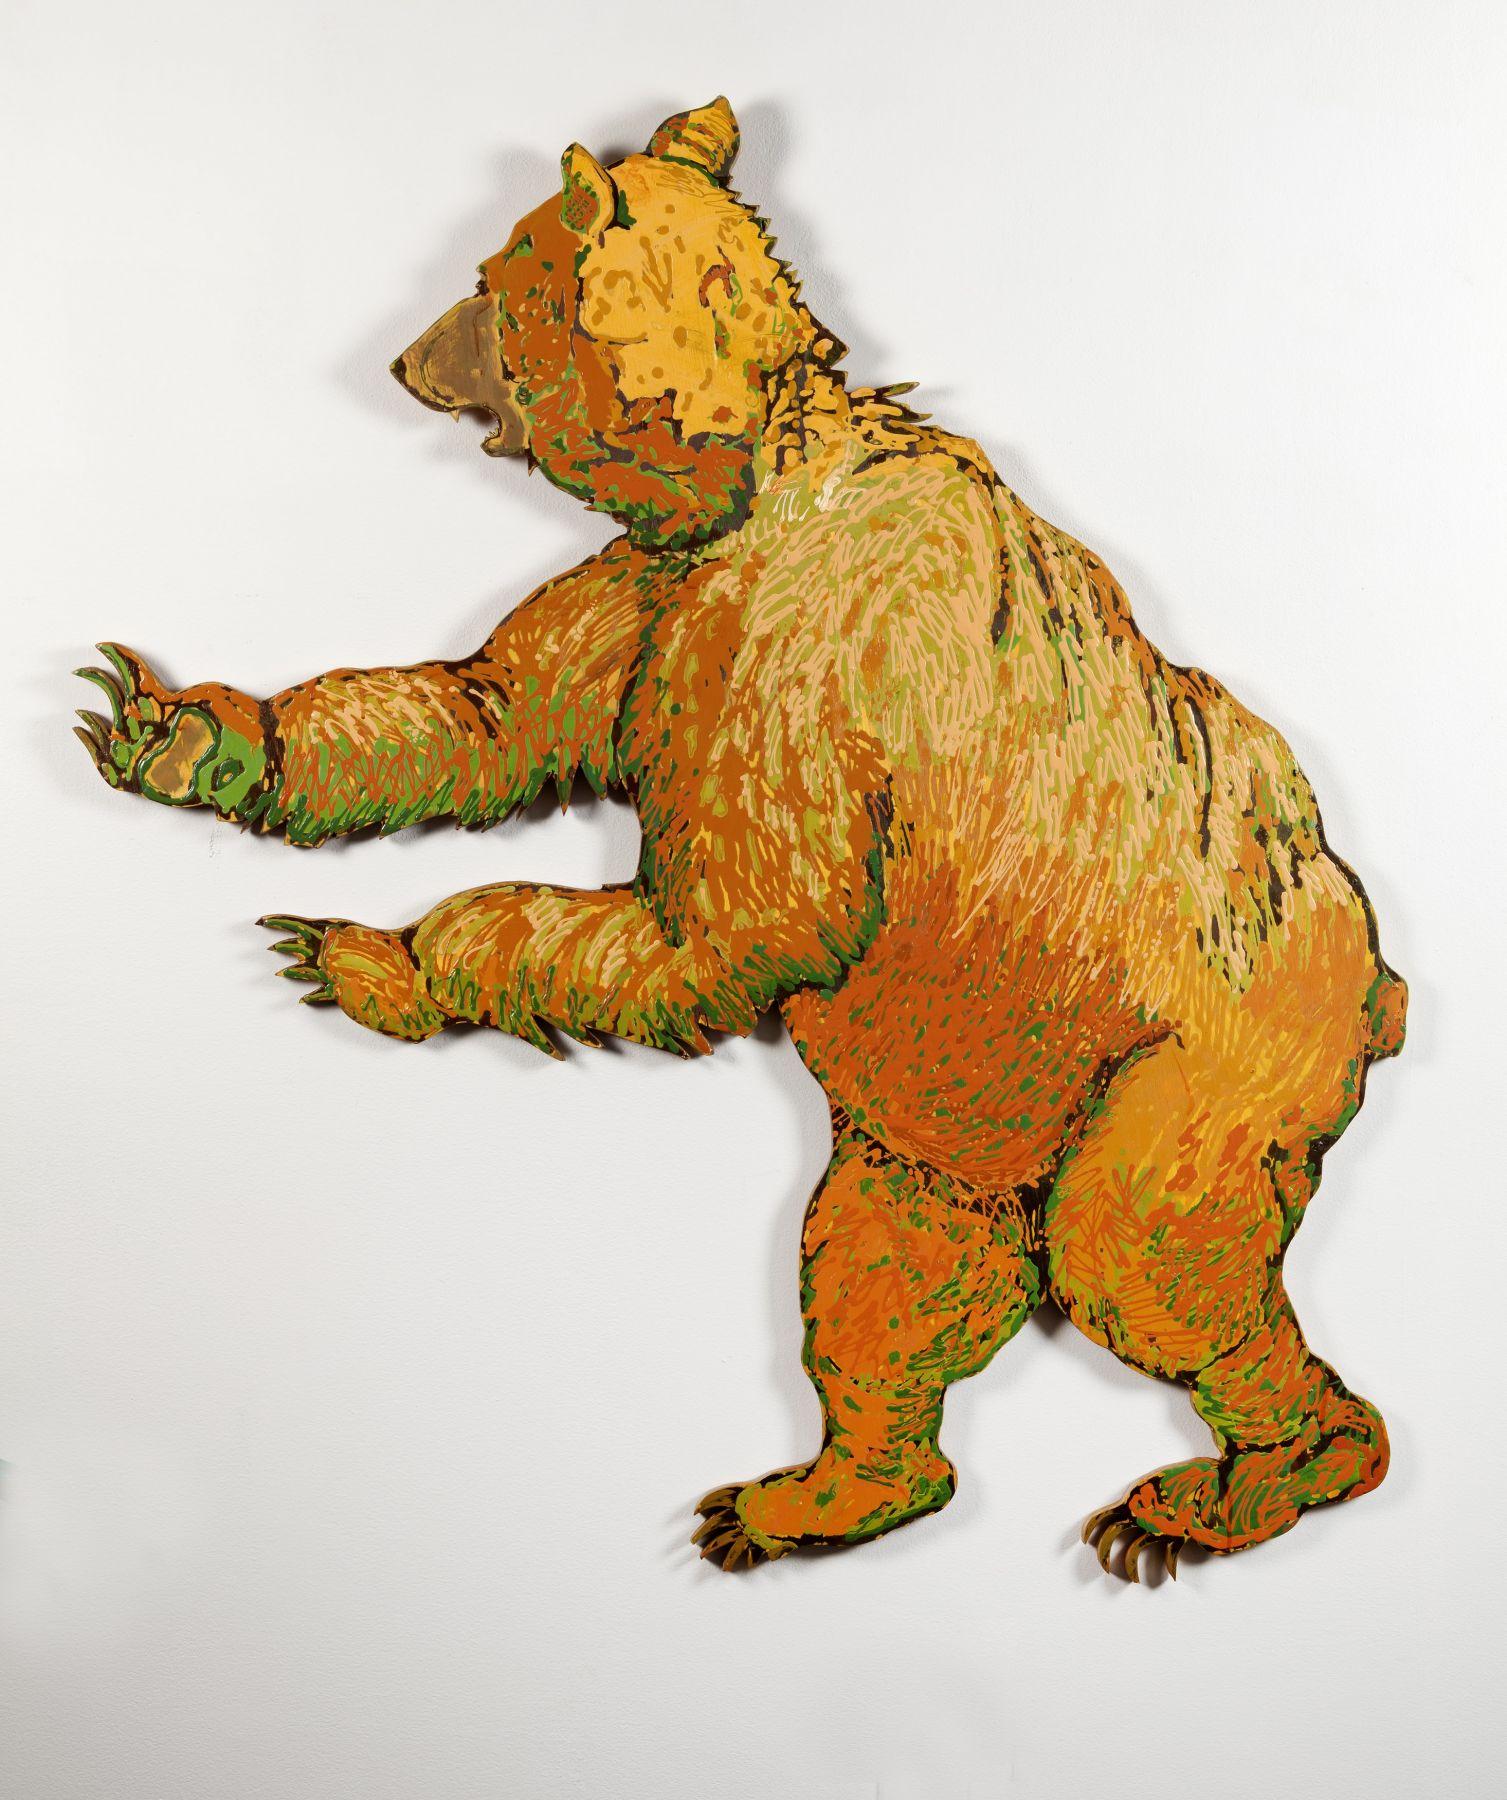 GINA PHILLIPS Honey Bear, 2014